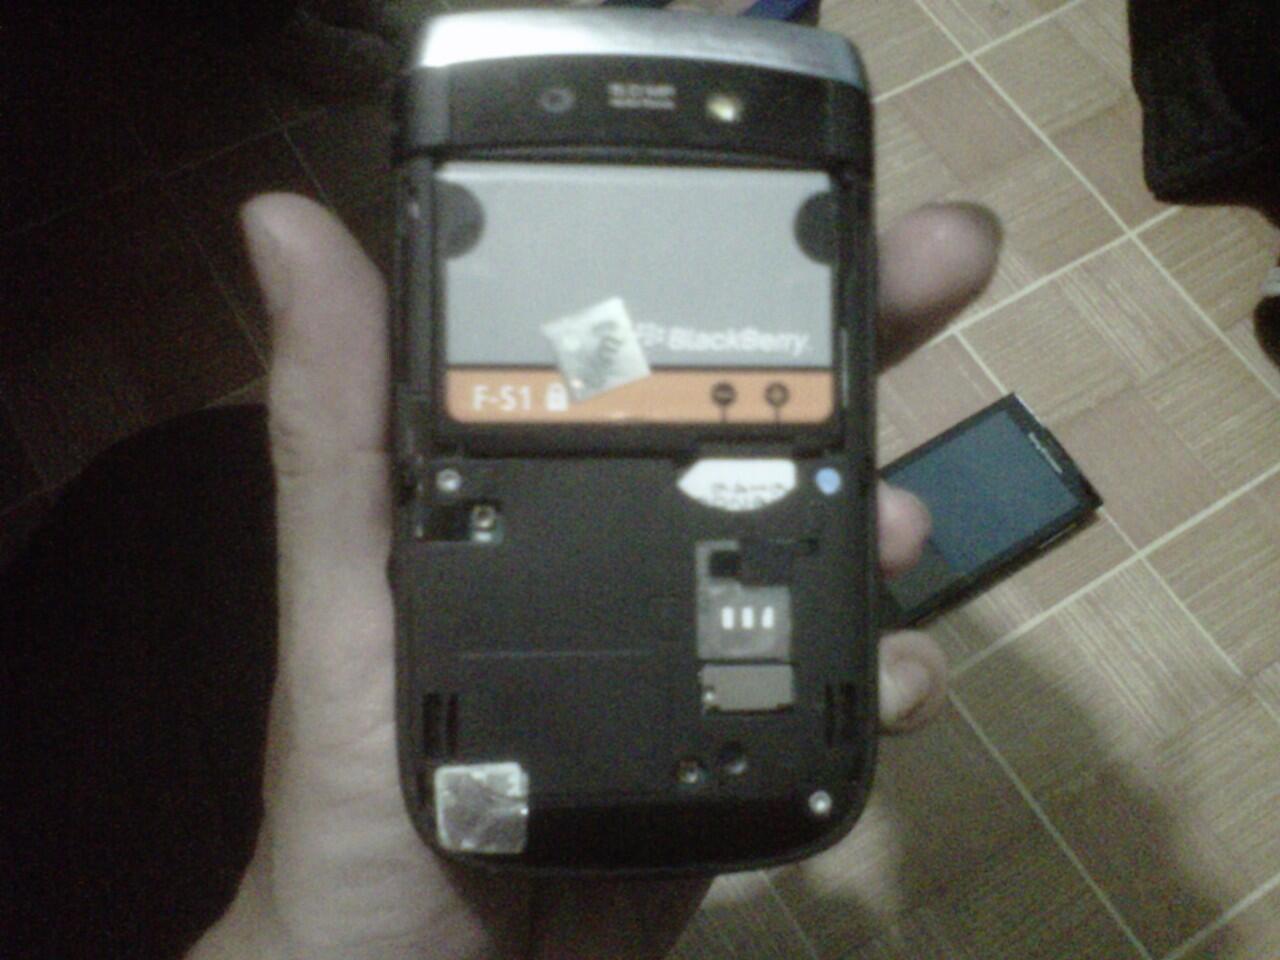 Blackberry 9810 Torch 2 batangan